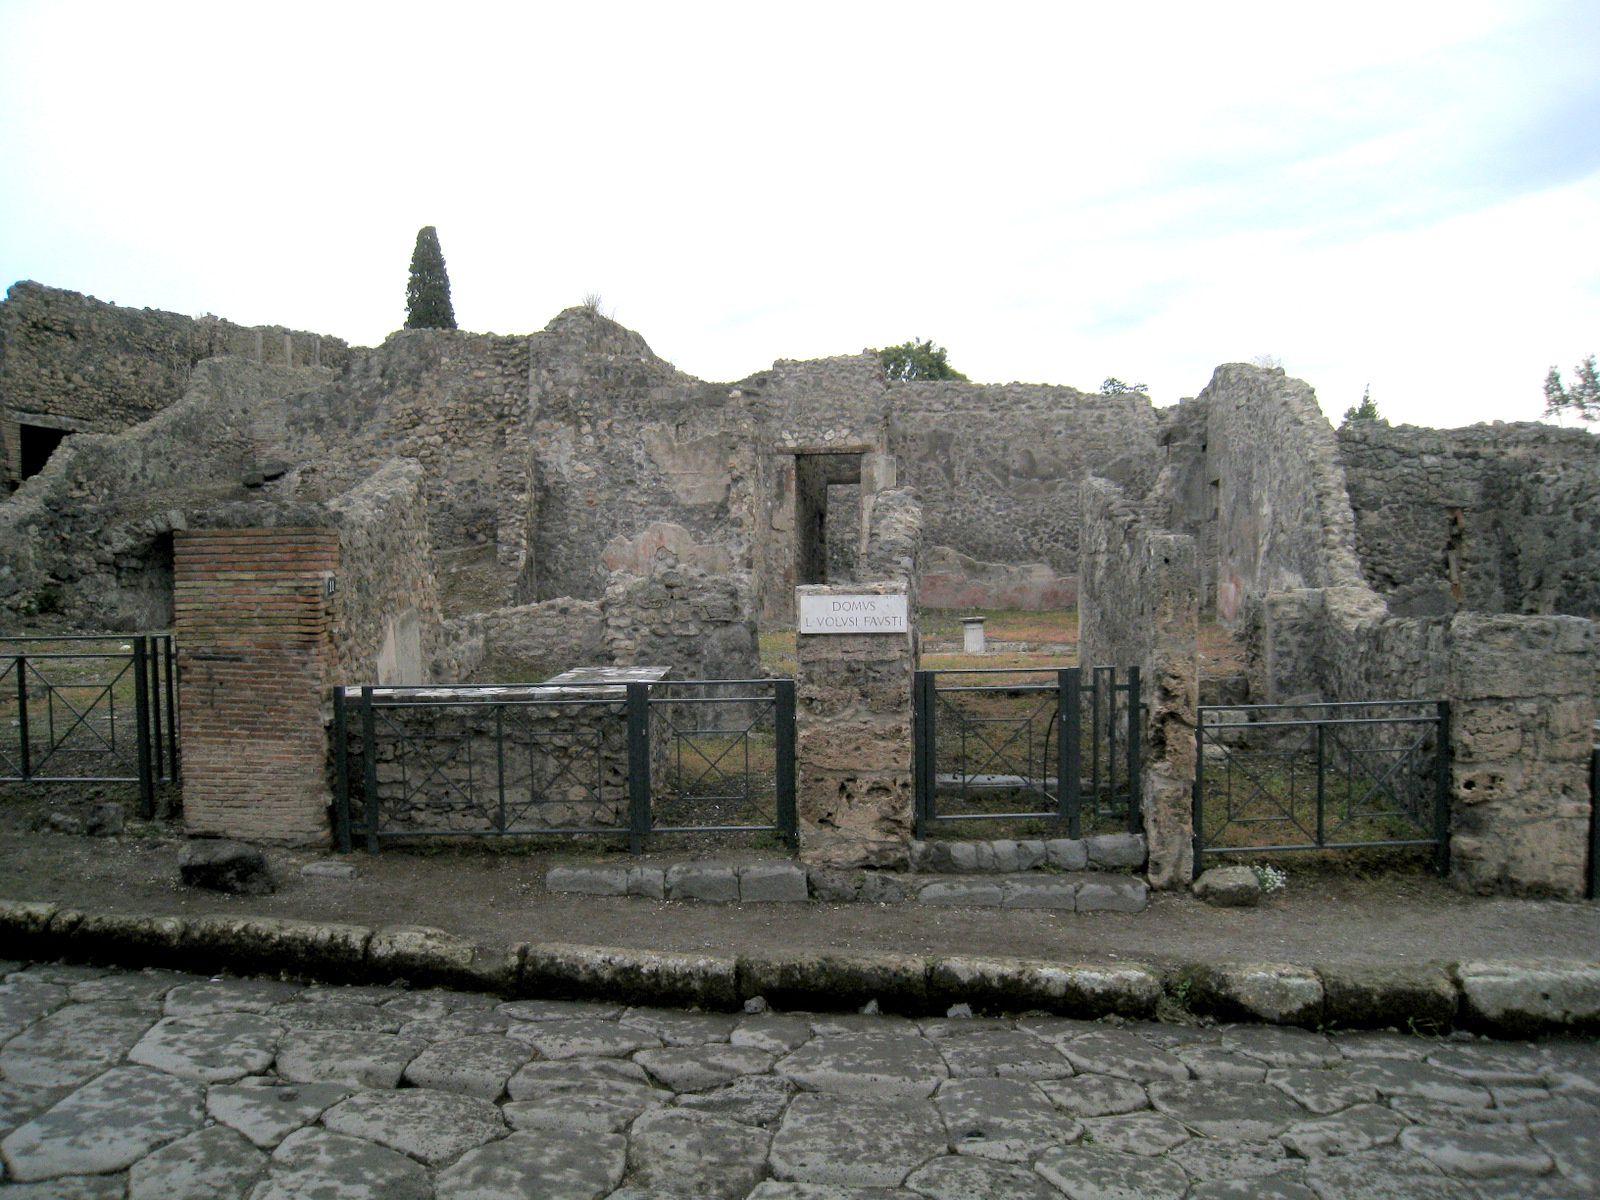 Une rue de Pompei, via di Stabia (Italie)